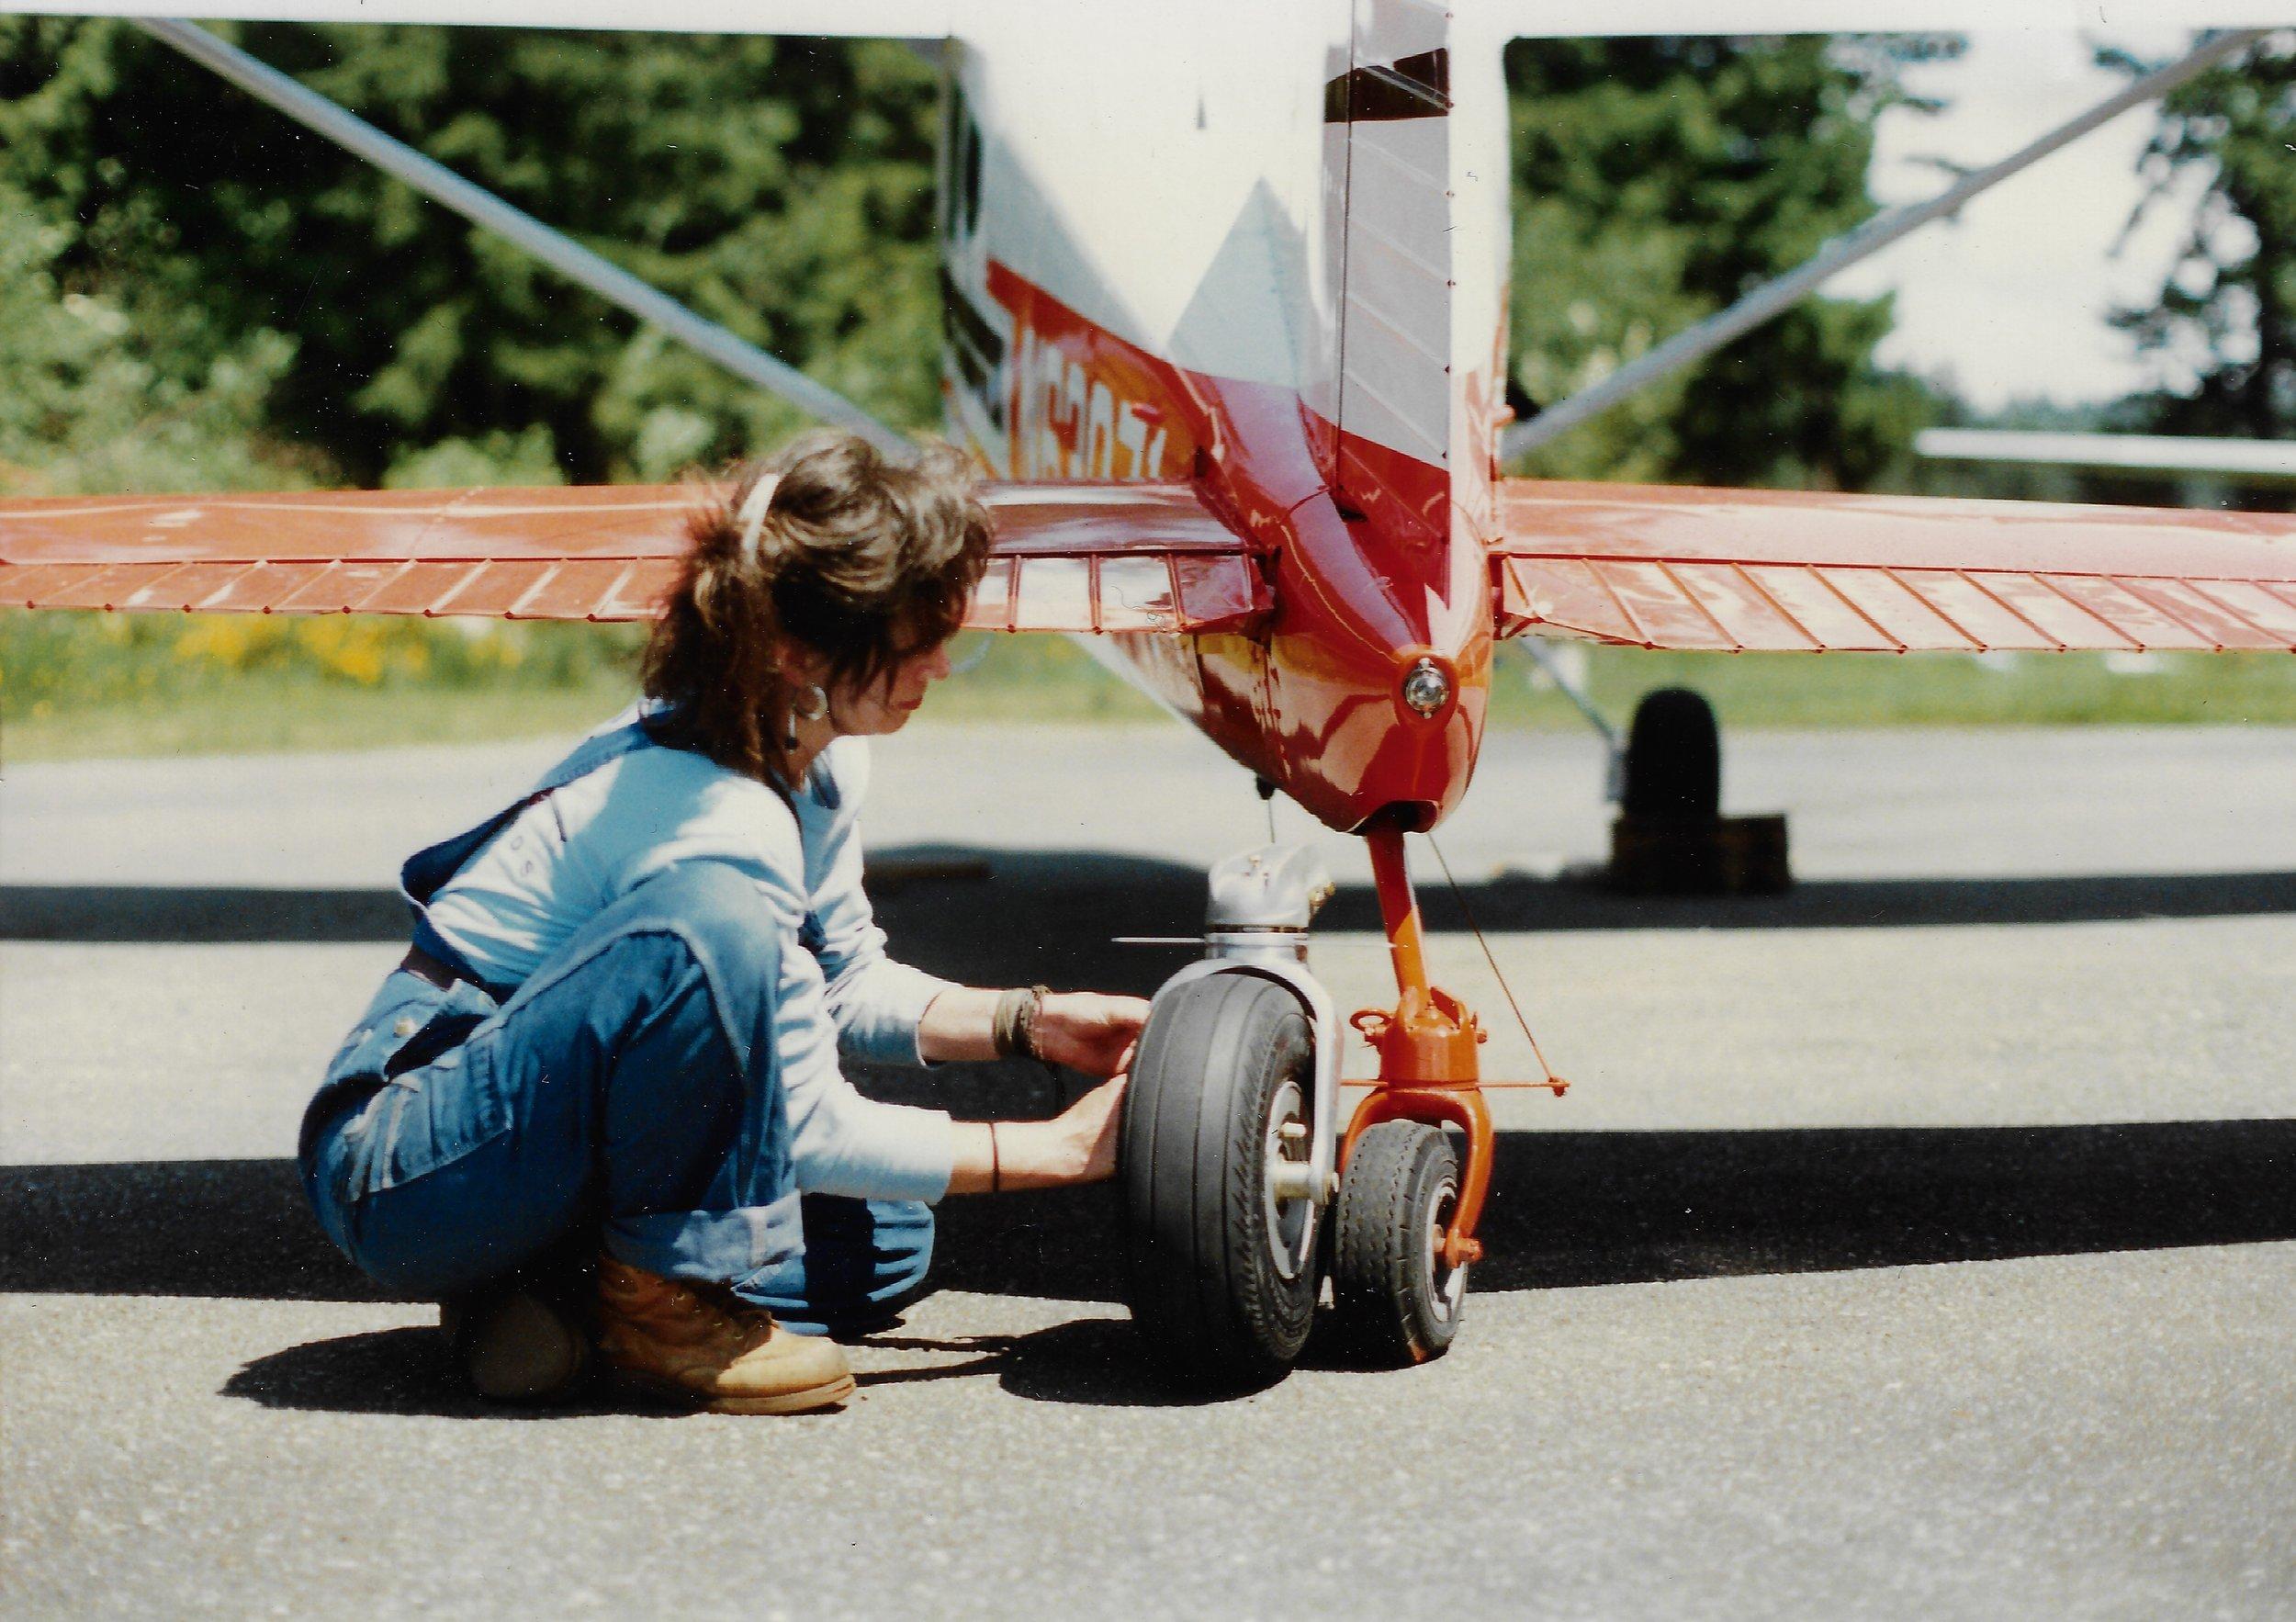 Tailwheel Troubleshooting Guide -